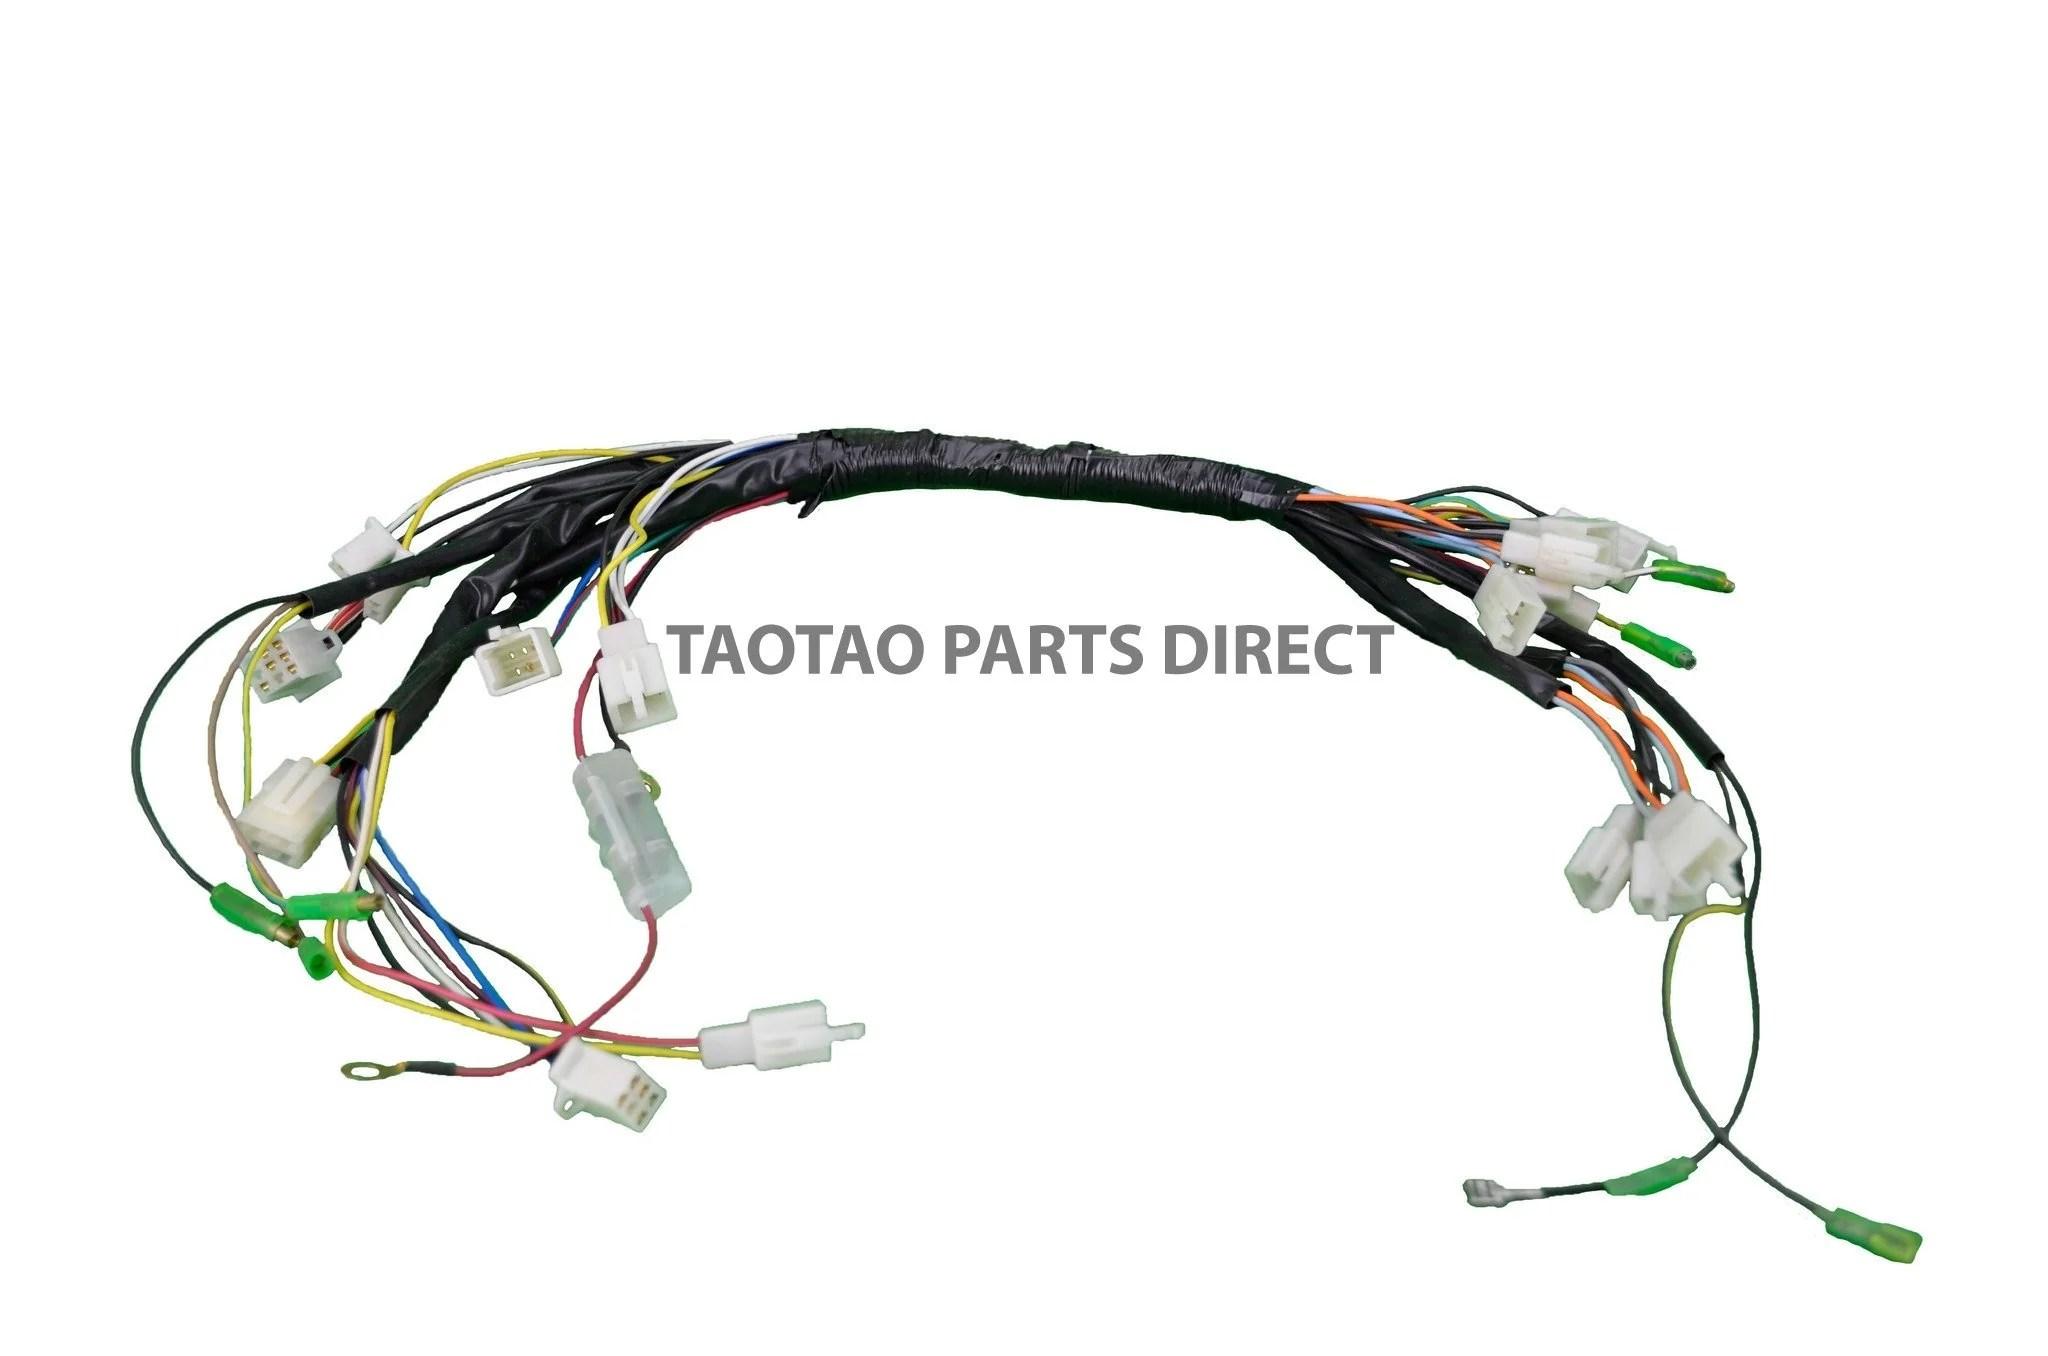 ata125d wire harness 15 taotaopartsdirect com [ 2048 x 1356 Pixel ]